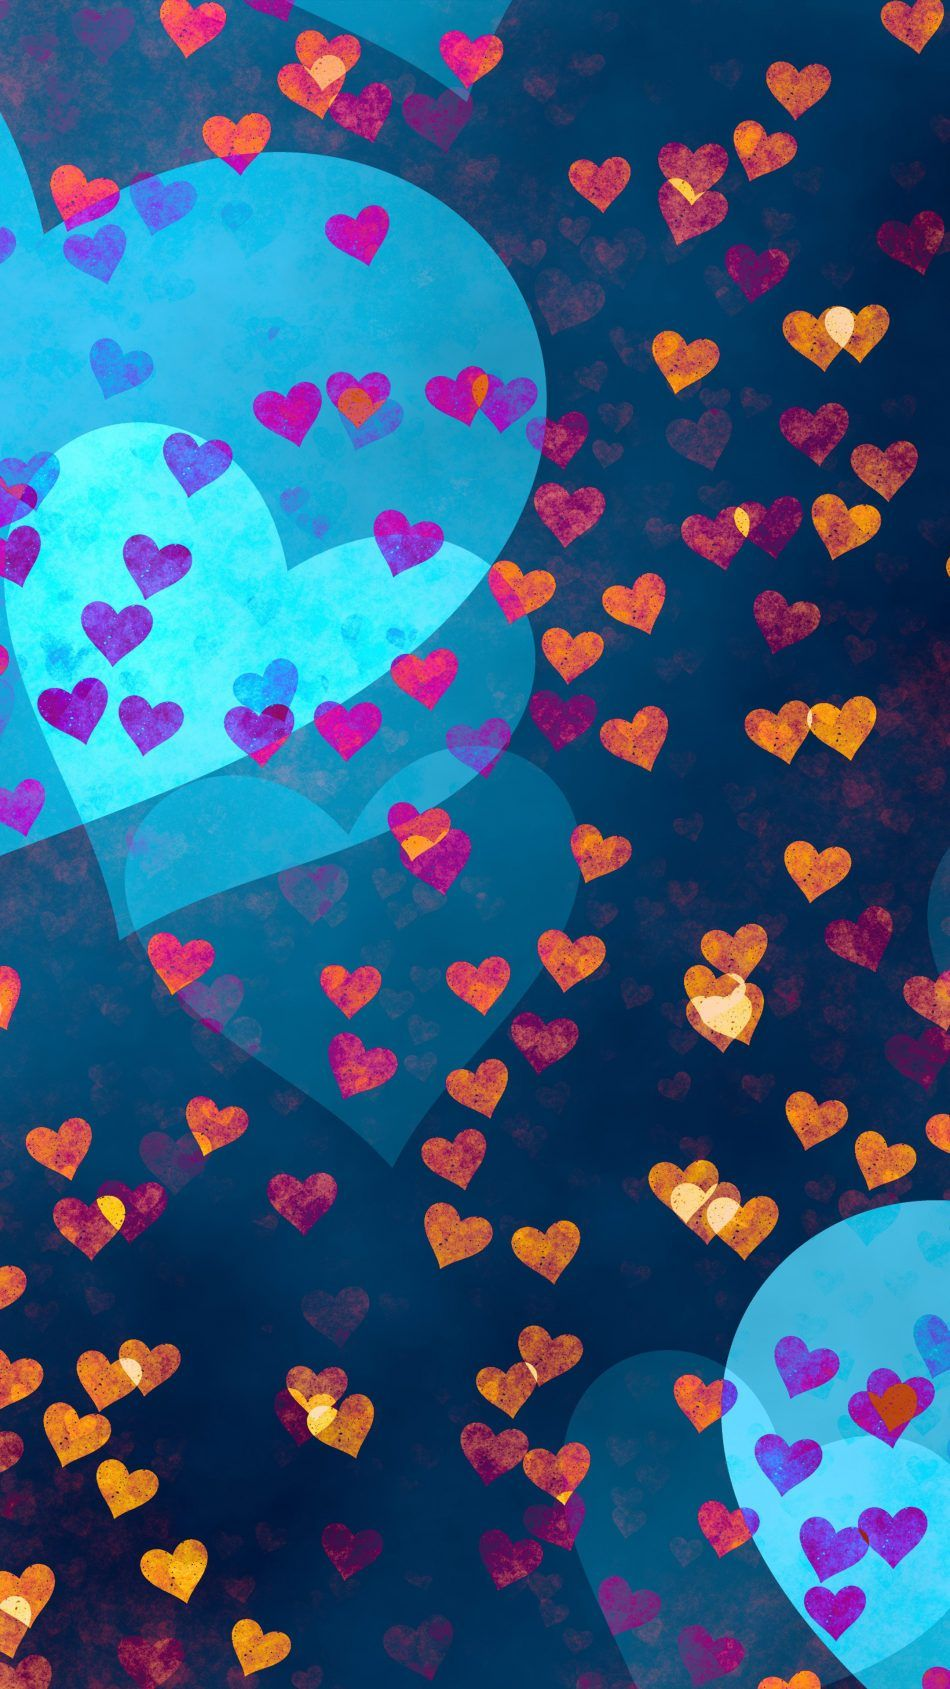 Love Hearts Pattern Fondos De Pantalla Walle Fondos